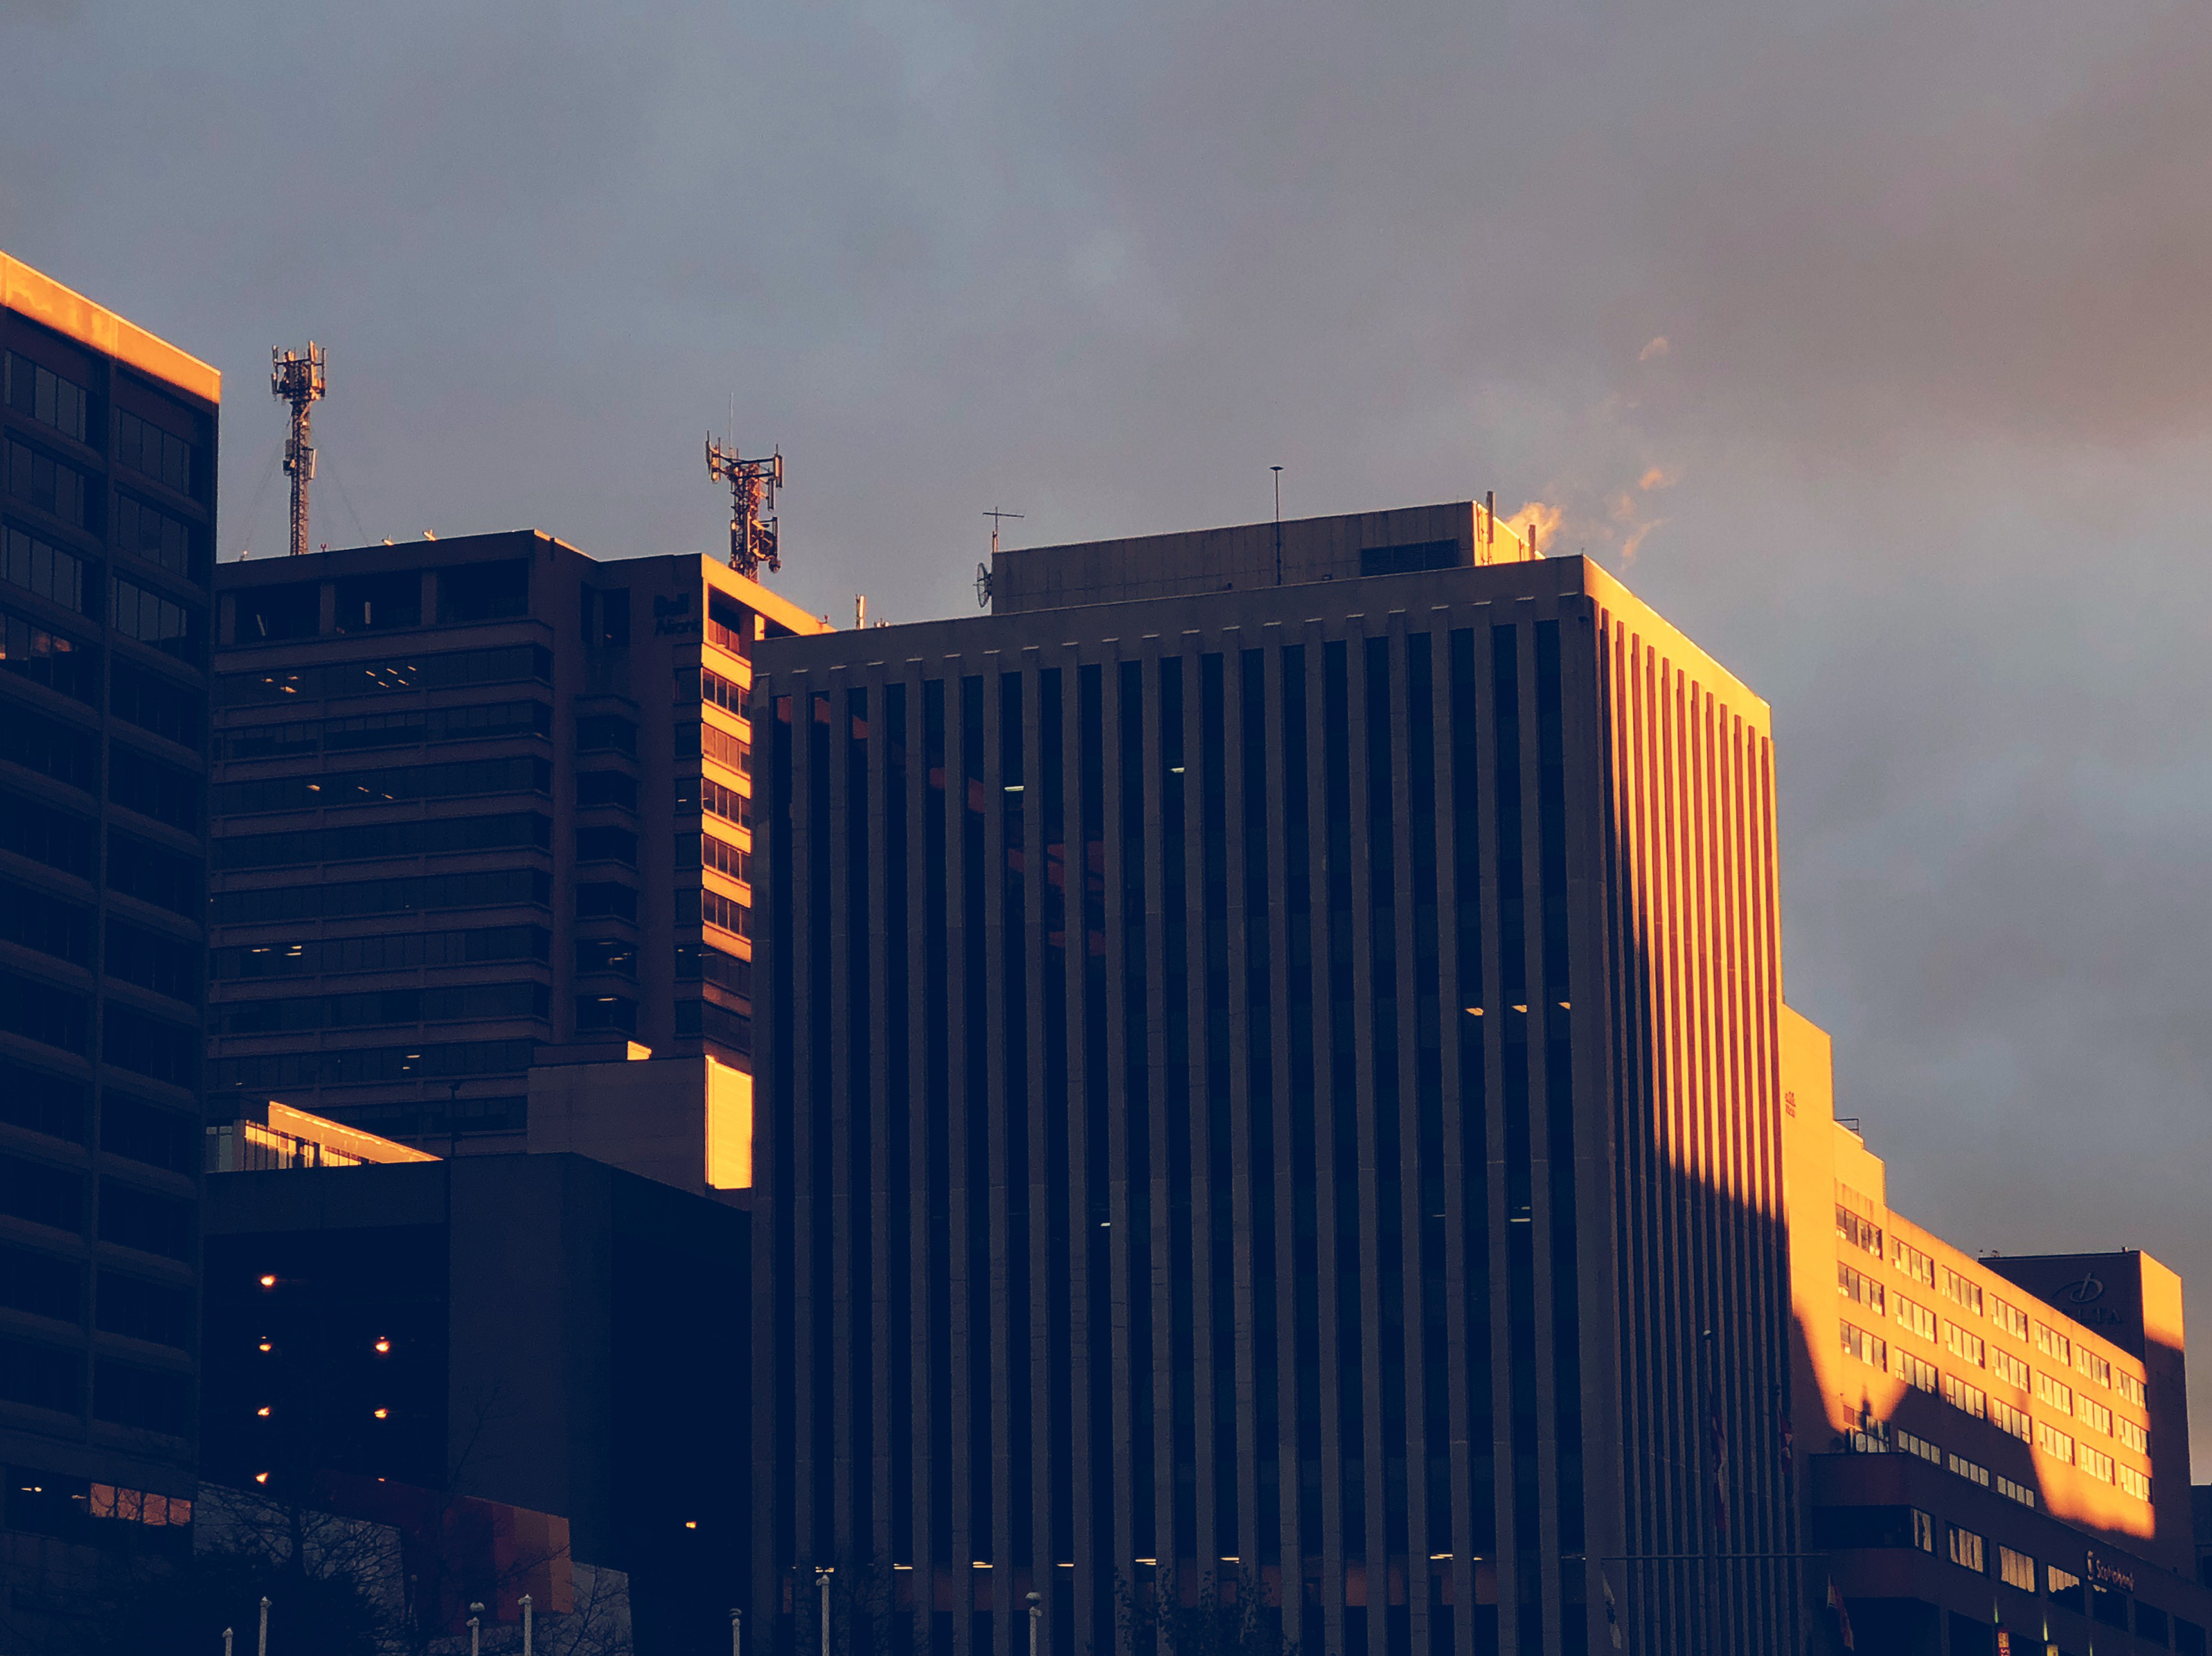 A photograph depicting King Street Buildings Saint John